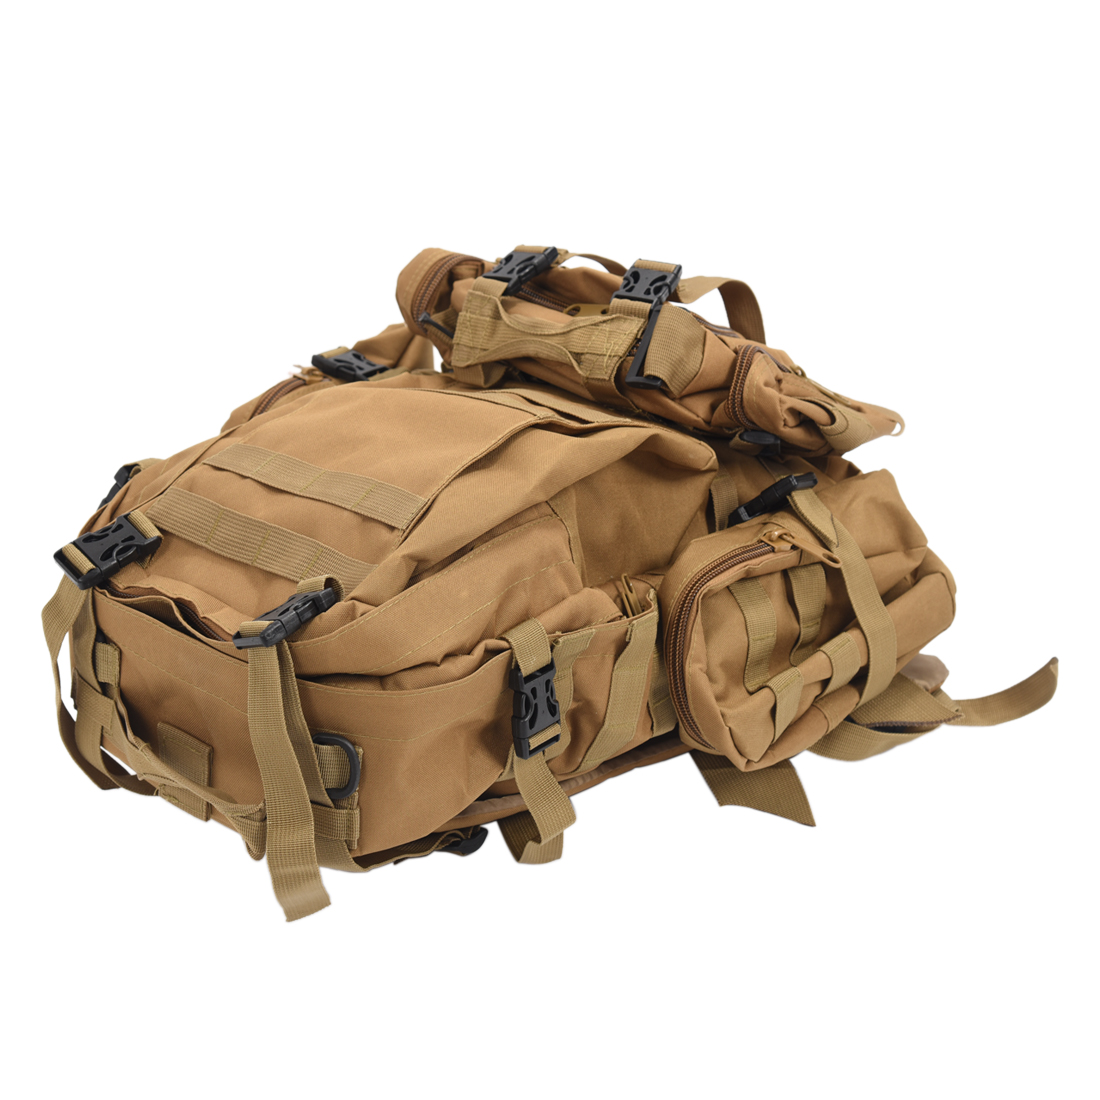 50L Large Capacity Tactical Military Outdoor Rucksacks Backpack Trekking Hiking Bag Mud color protector plus outdoor 55l bag military tactical large backpack rucksacks for explorer hiking camping trekking gym molle bags